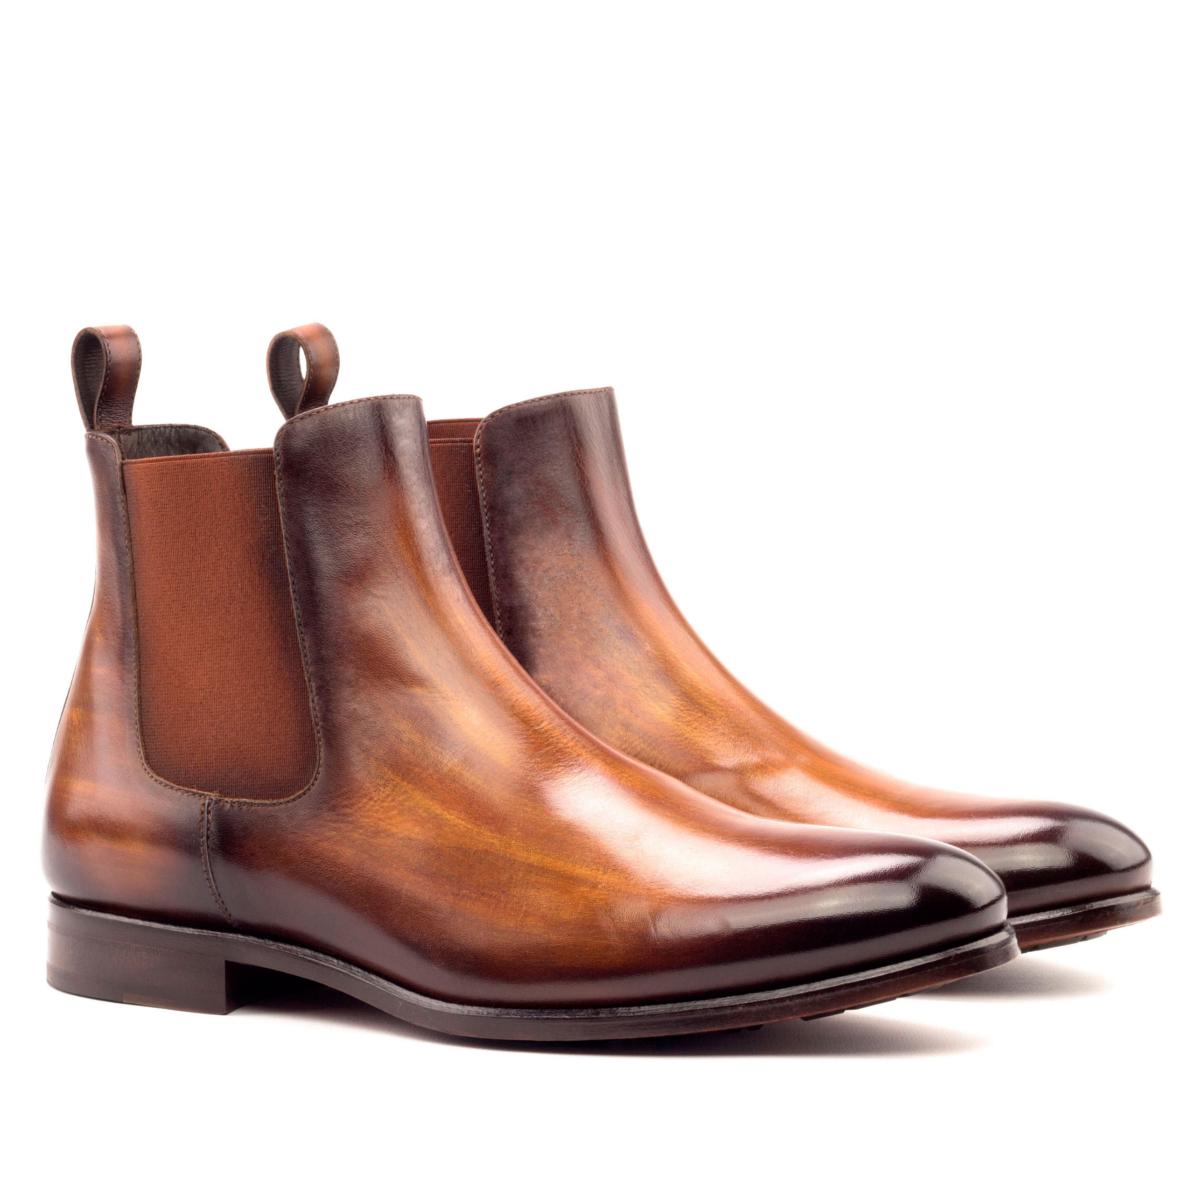 Chelsea boot crust patina